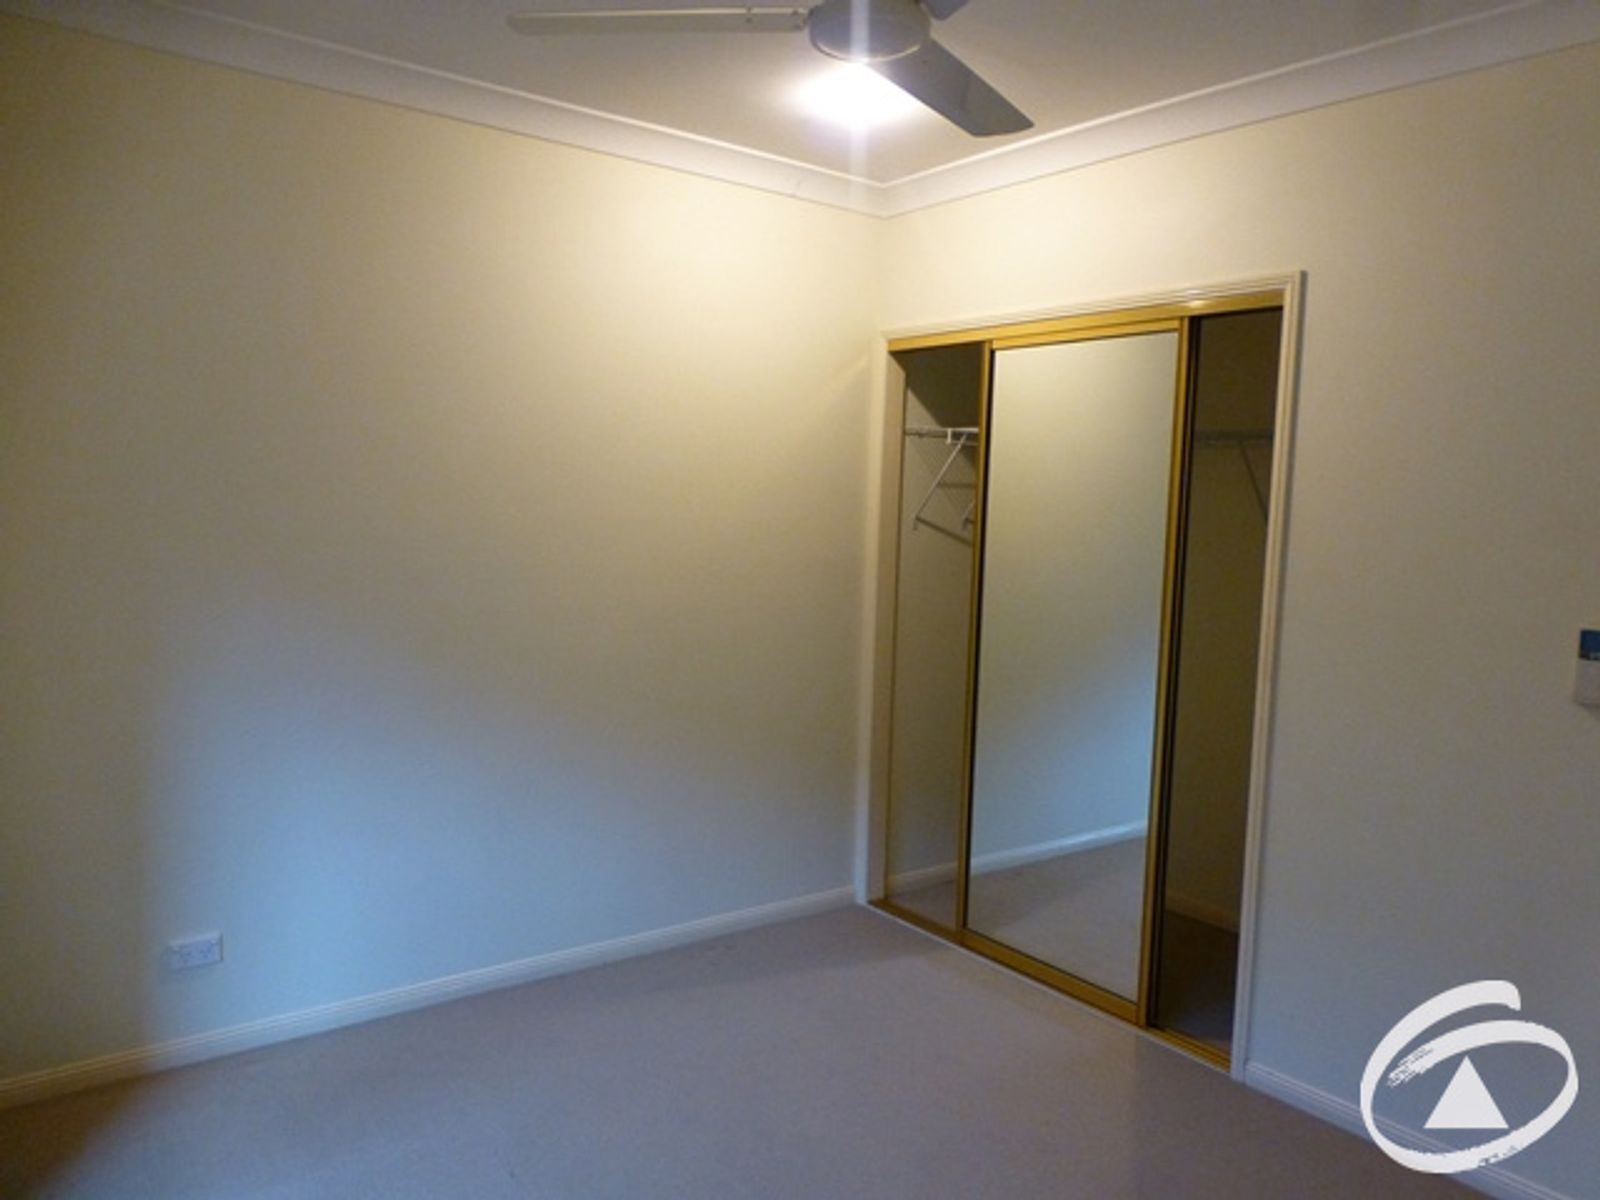 47 Chesterfield Close, Brinsmead, QLD 4870